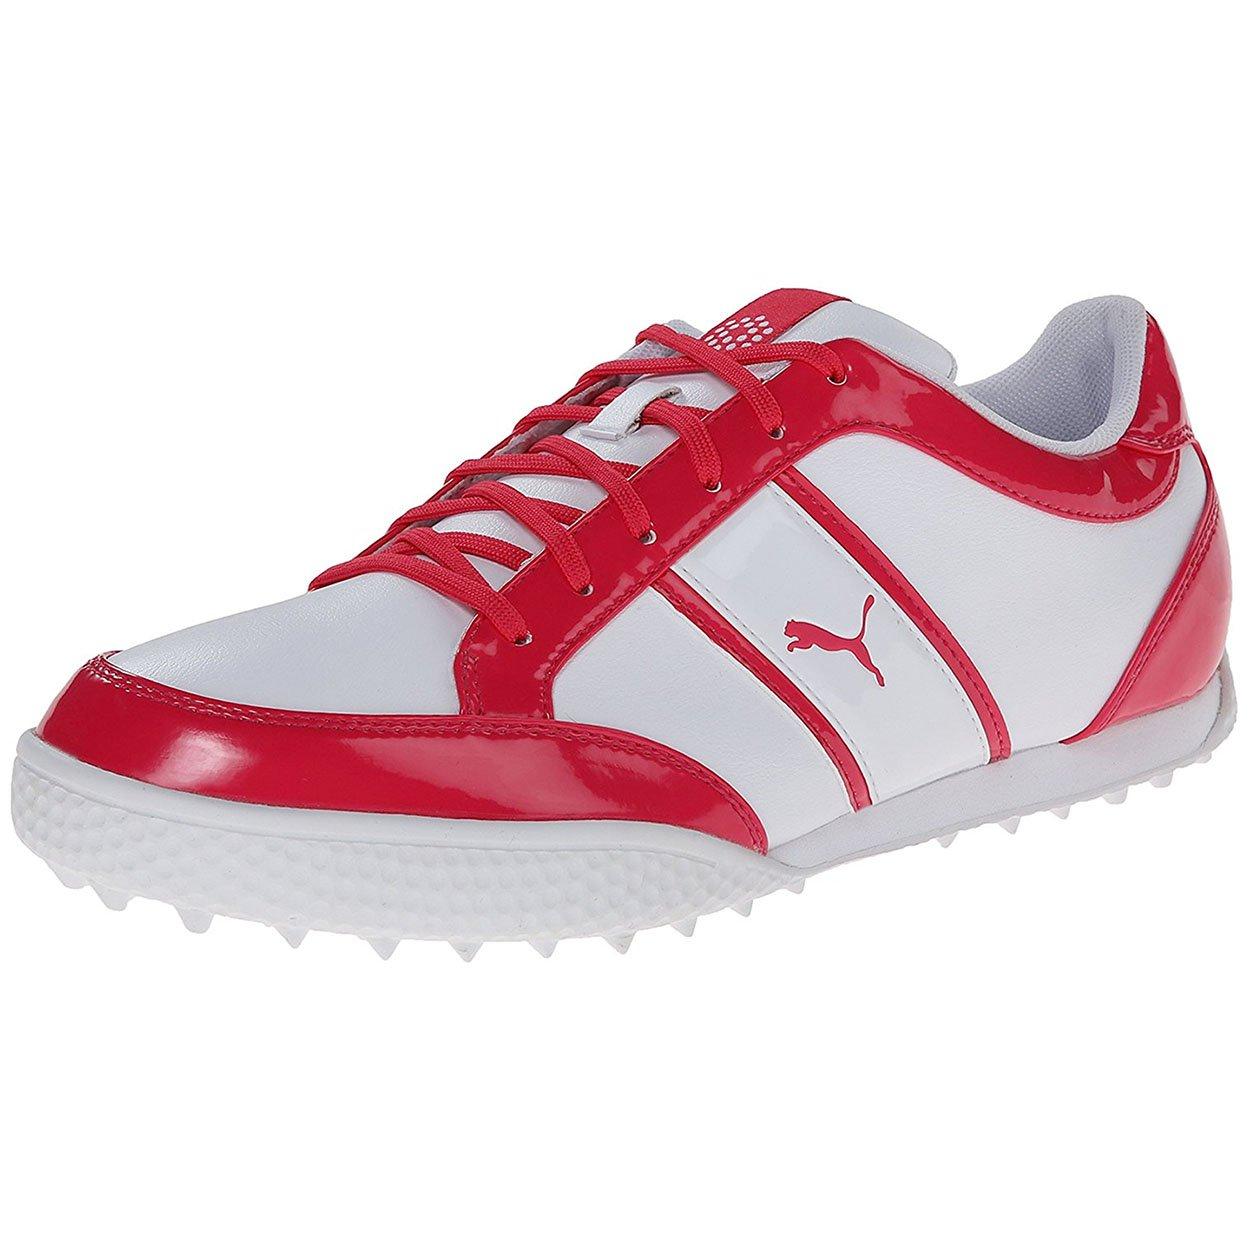 PUMA Women's Monolite Cat Golf Shoe Spikeless, White/Raspberry, 8 M US